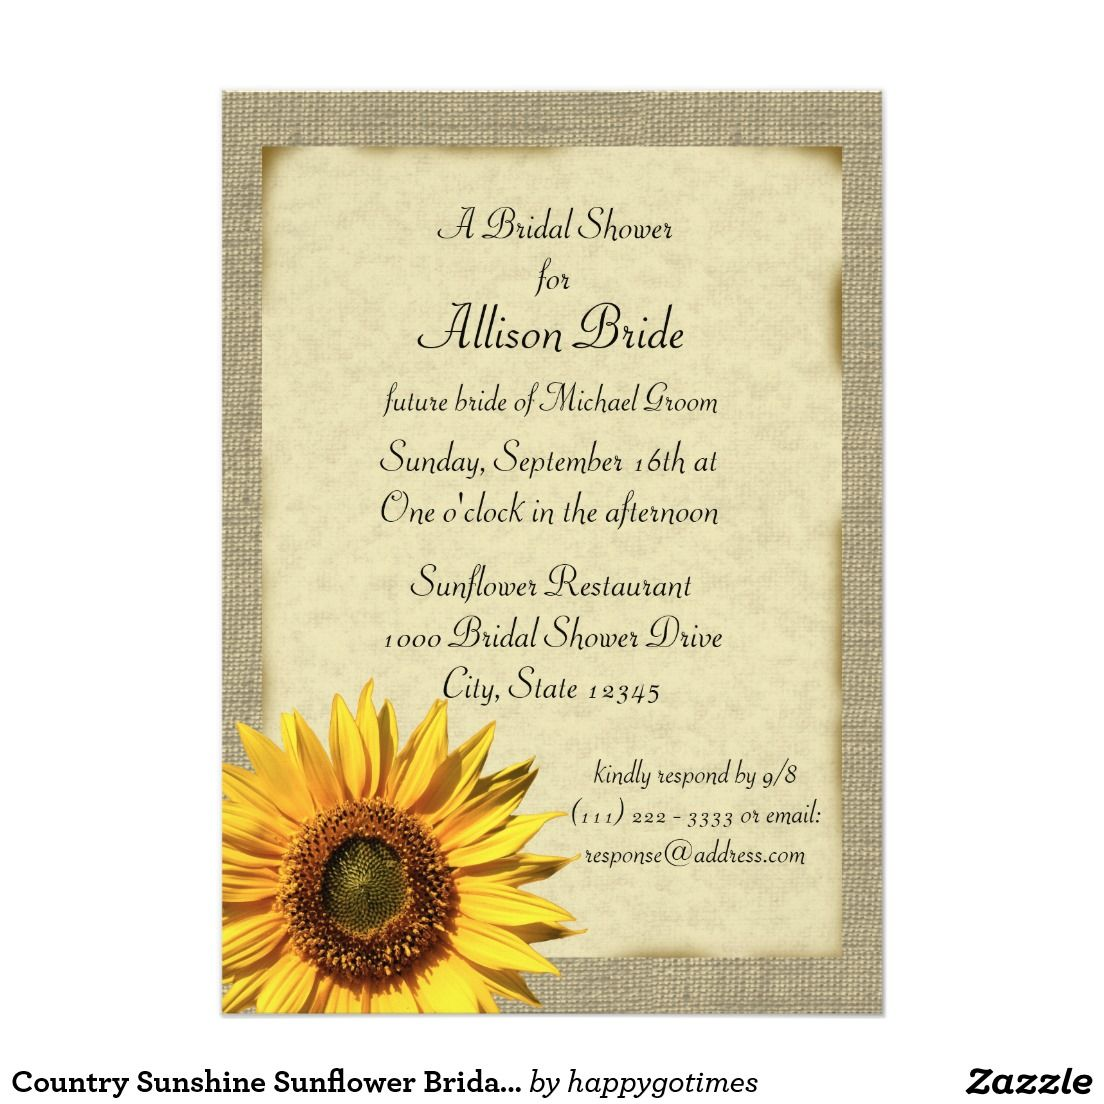 Country Sunshine Sunflower Bridal Shower Card | Bridal shower ...